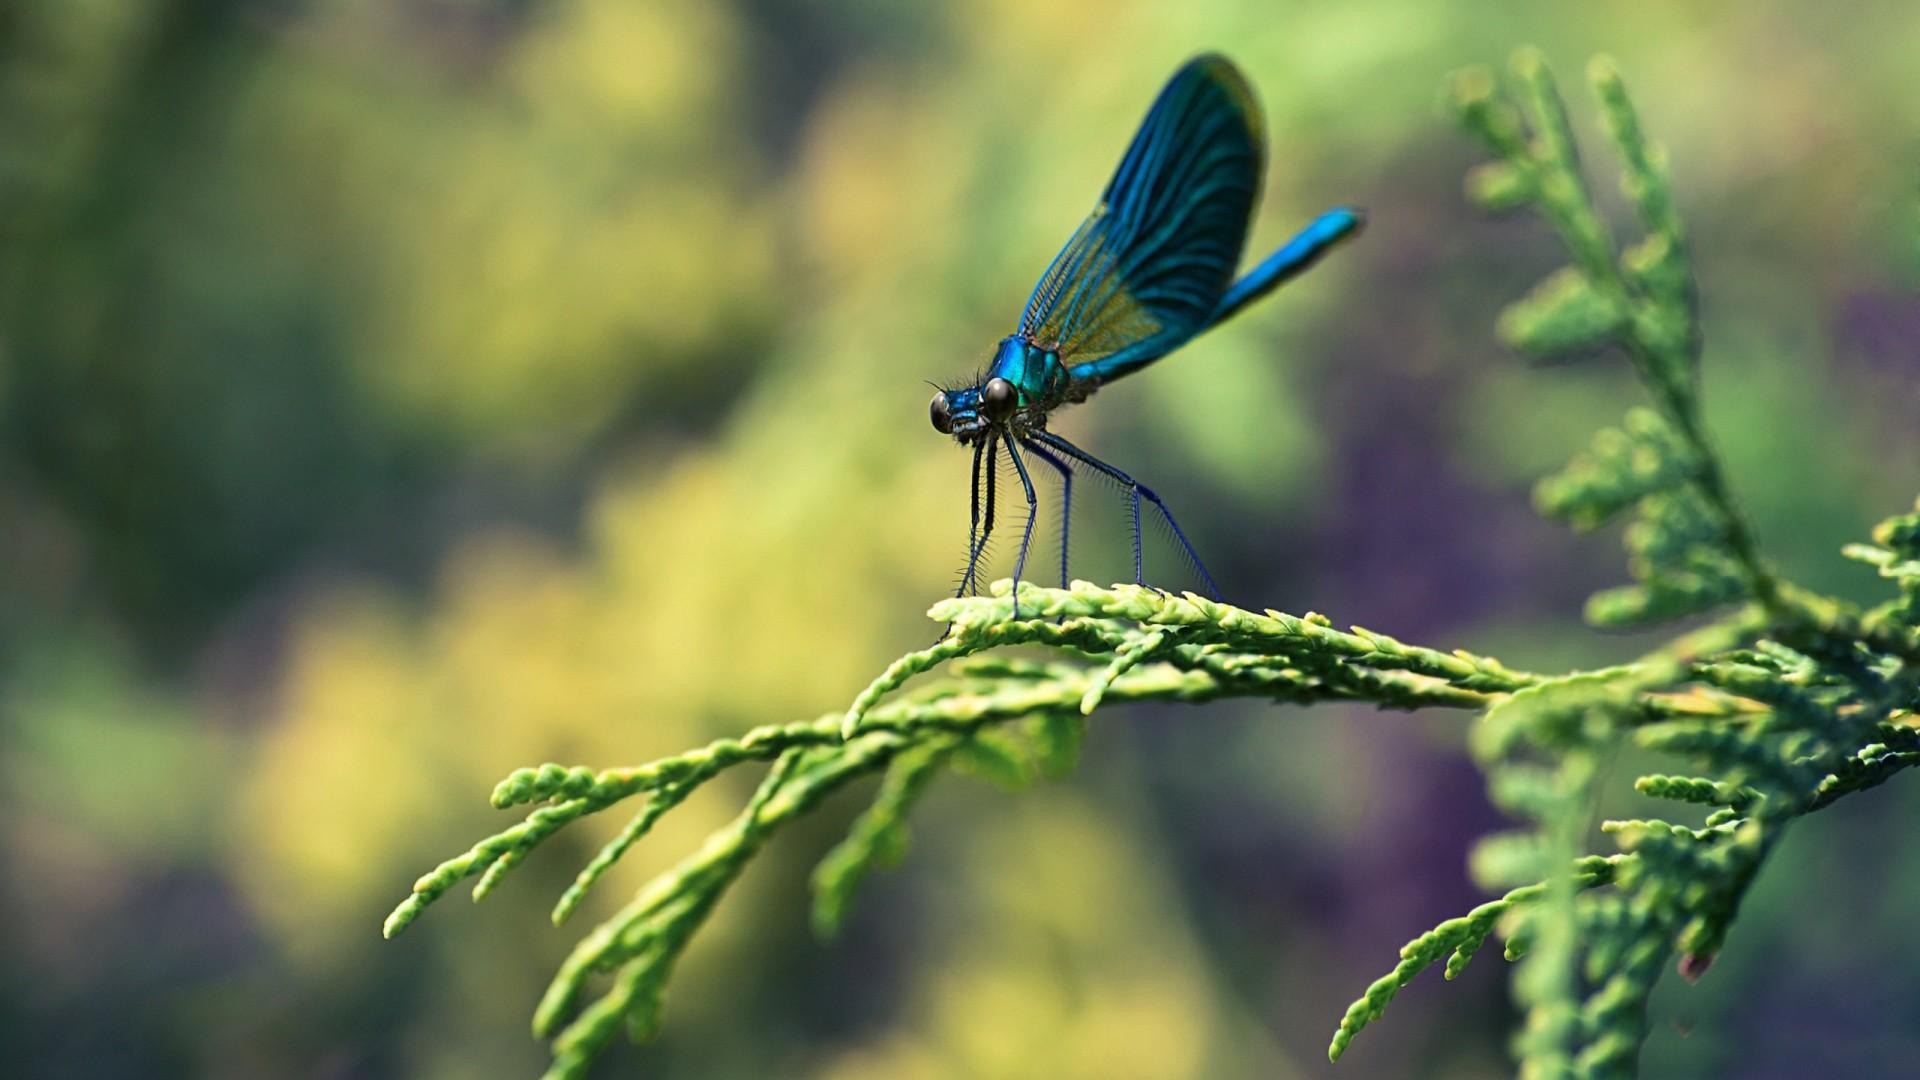 Blue Dragonfly Macro Wallpaper   New HD Wallpapers 1920x1080